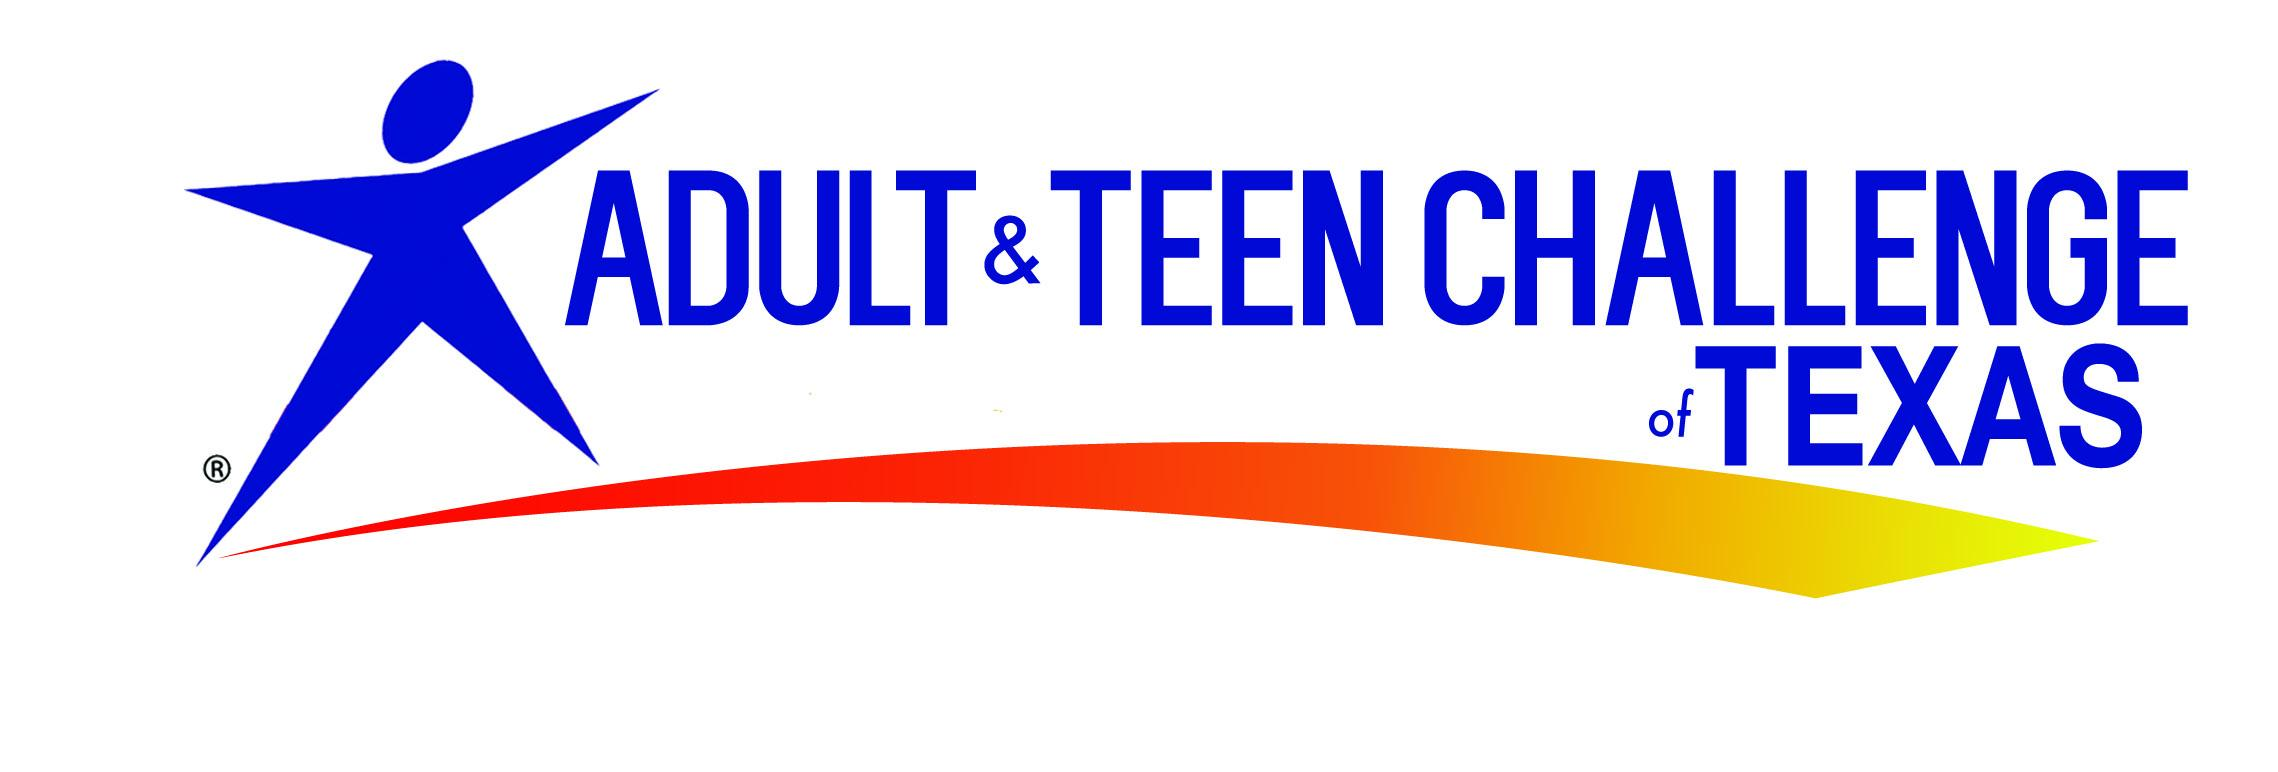 New york city teen challenge